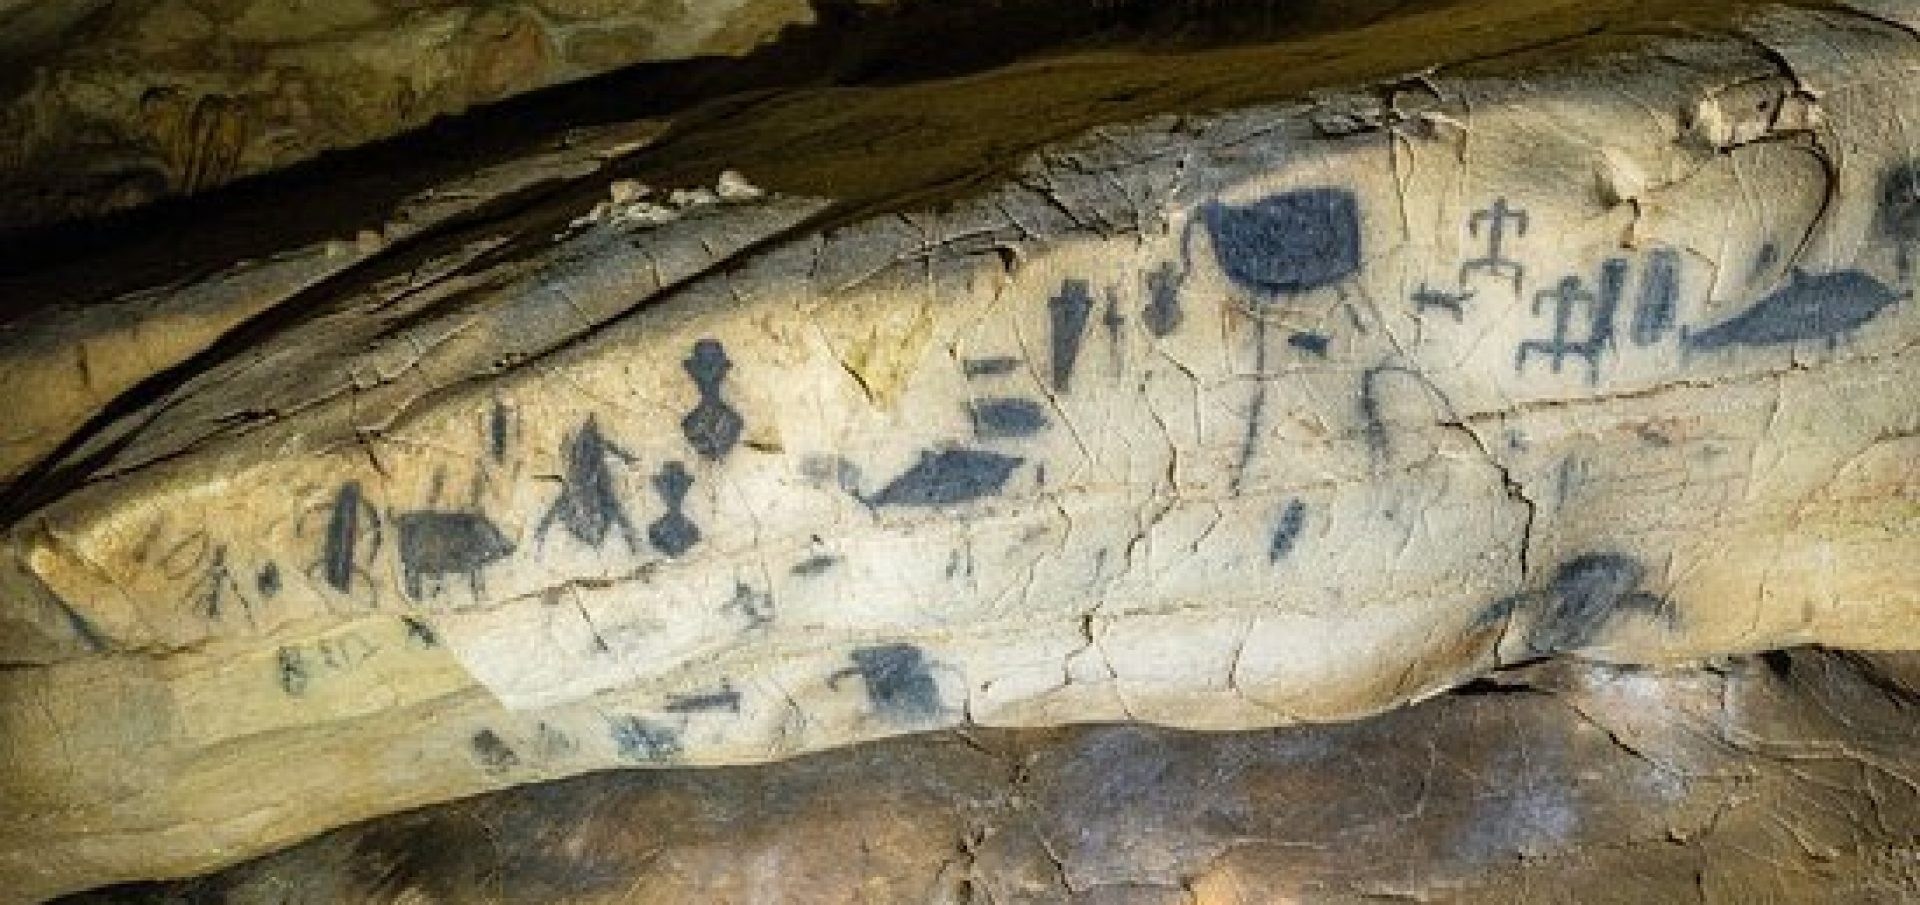 Grotte Peinture Rupestres